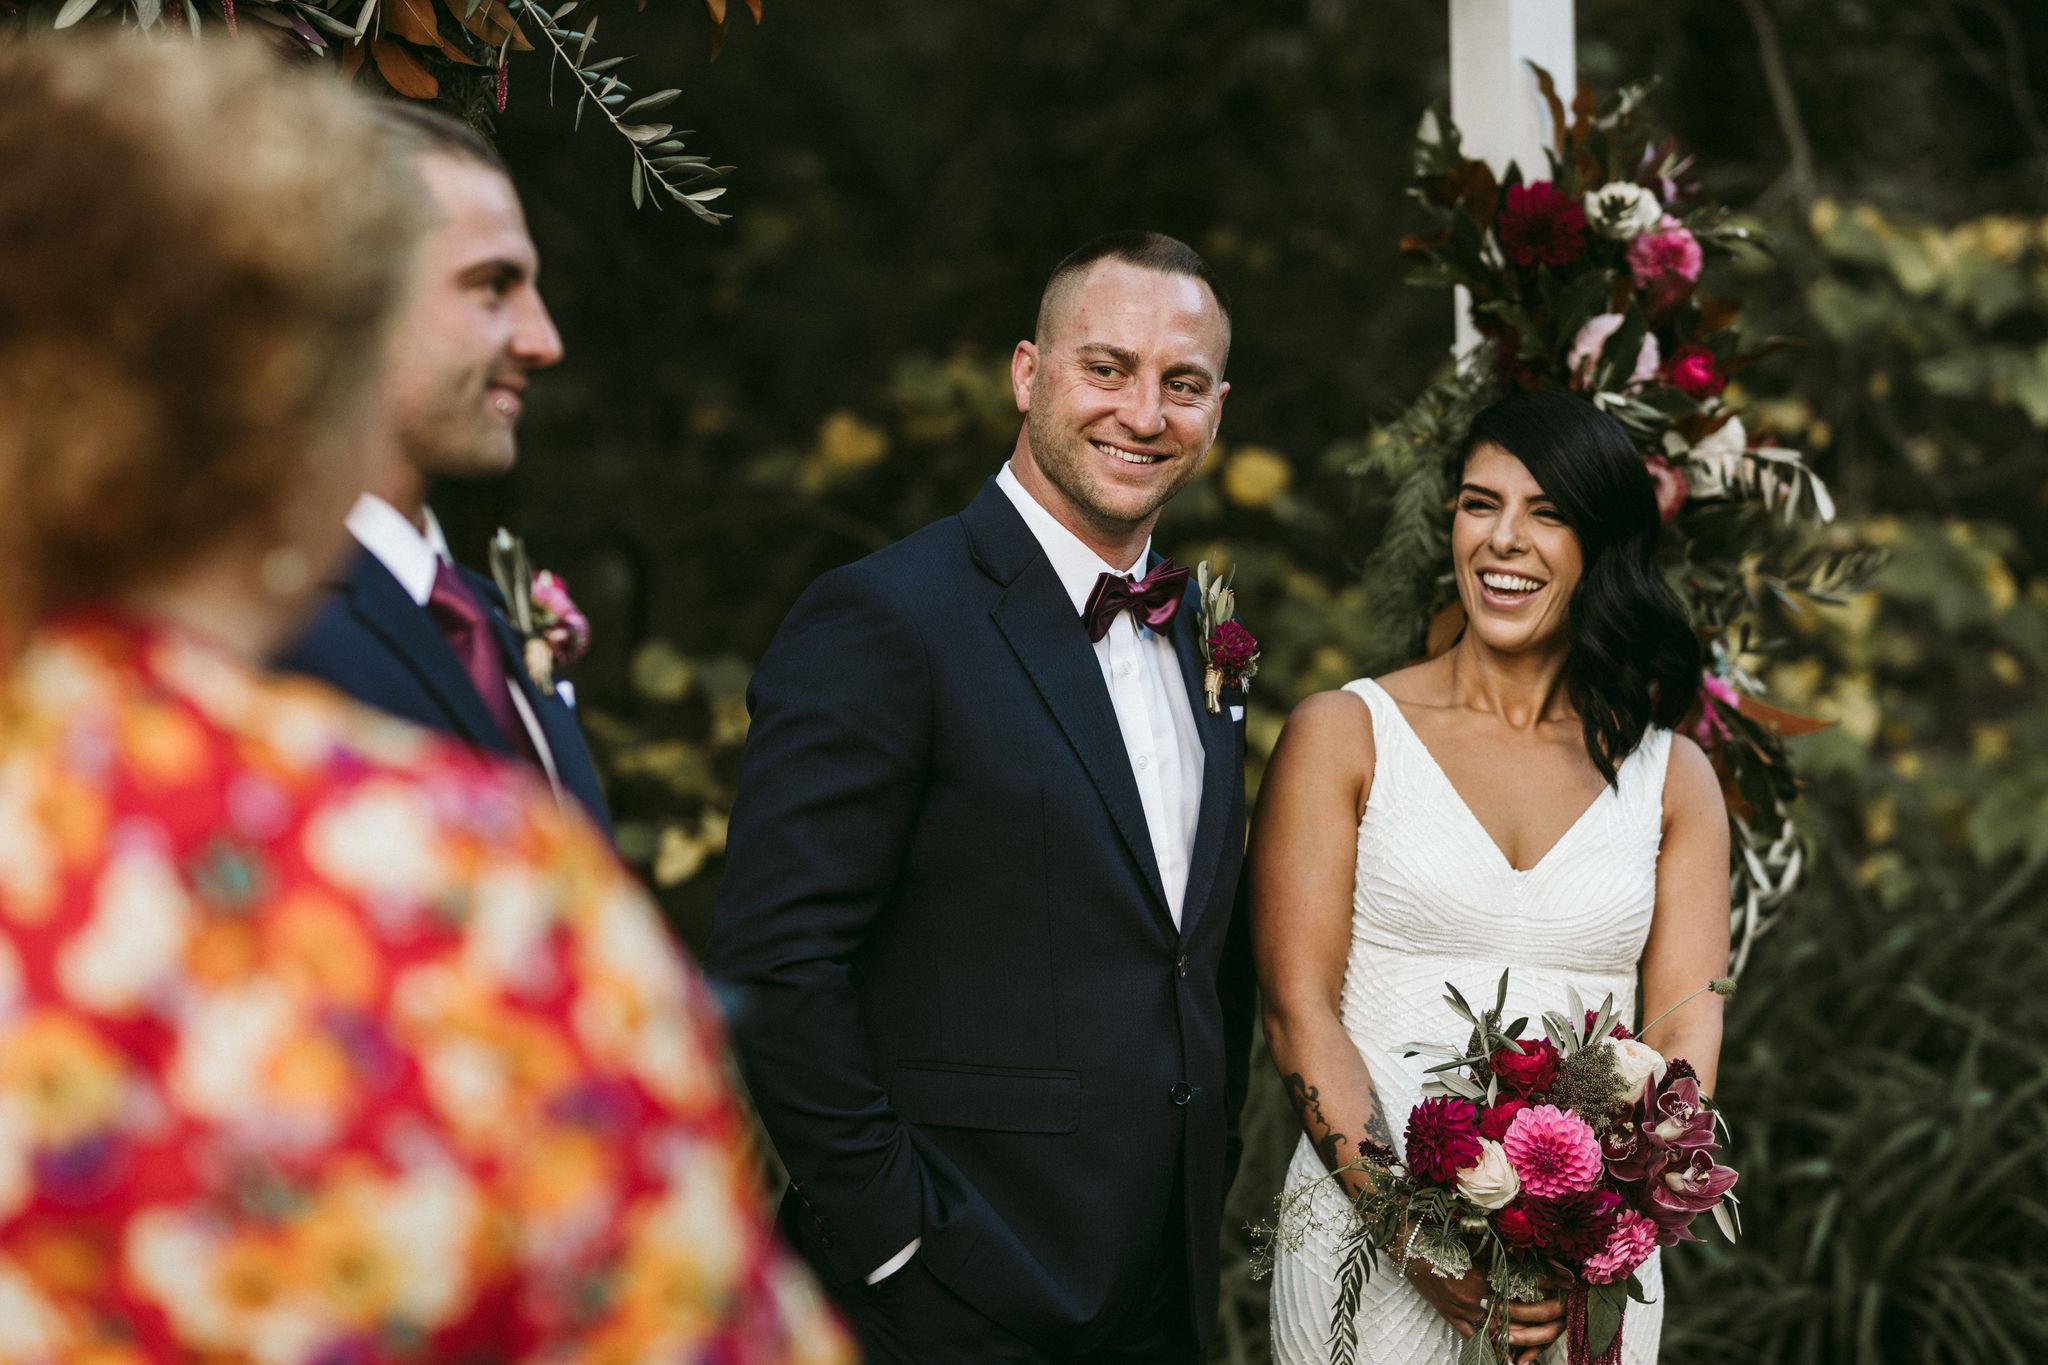 Vanessa&Ryan_02_Ceremony_HR-116.jpg